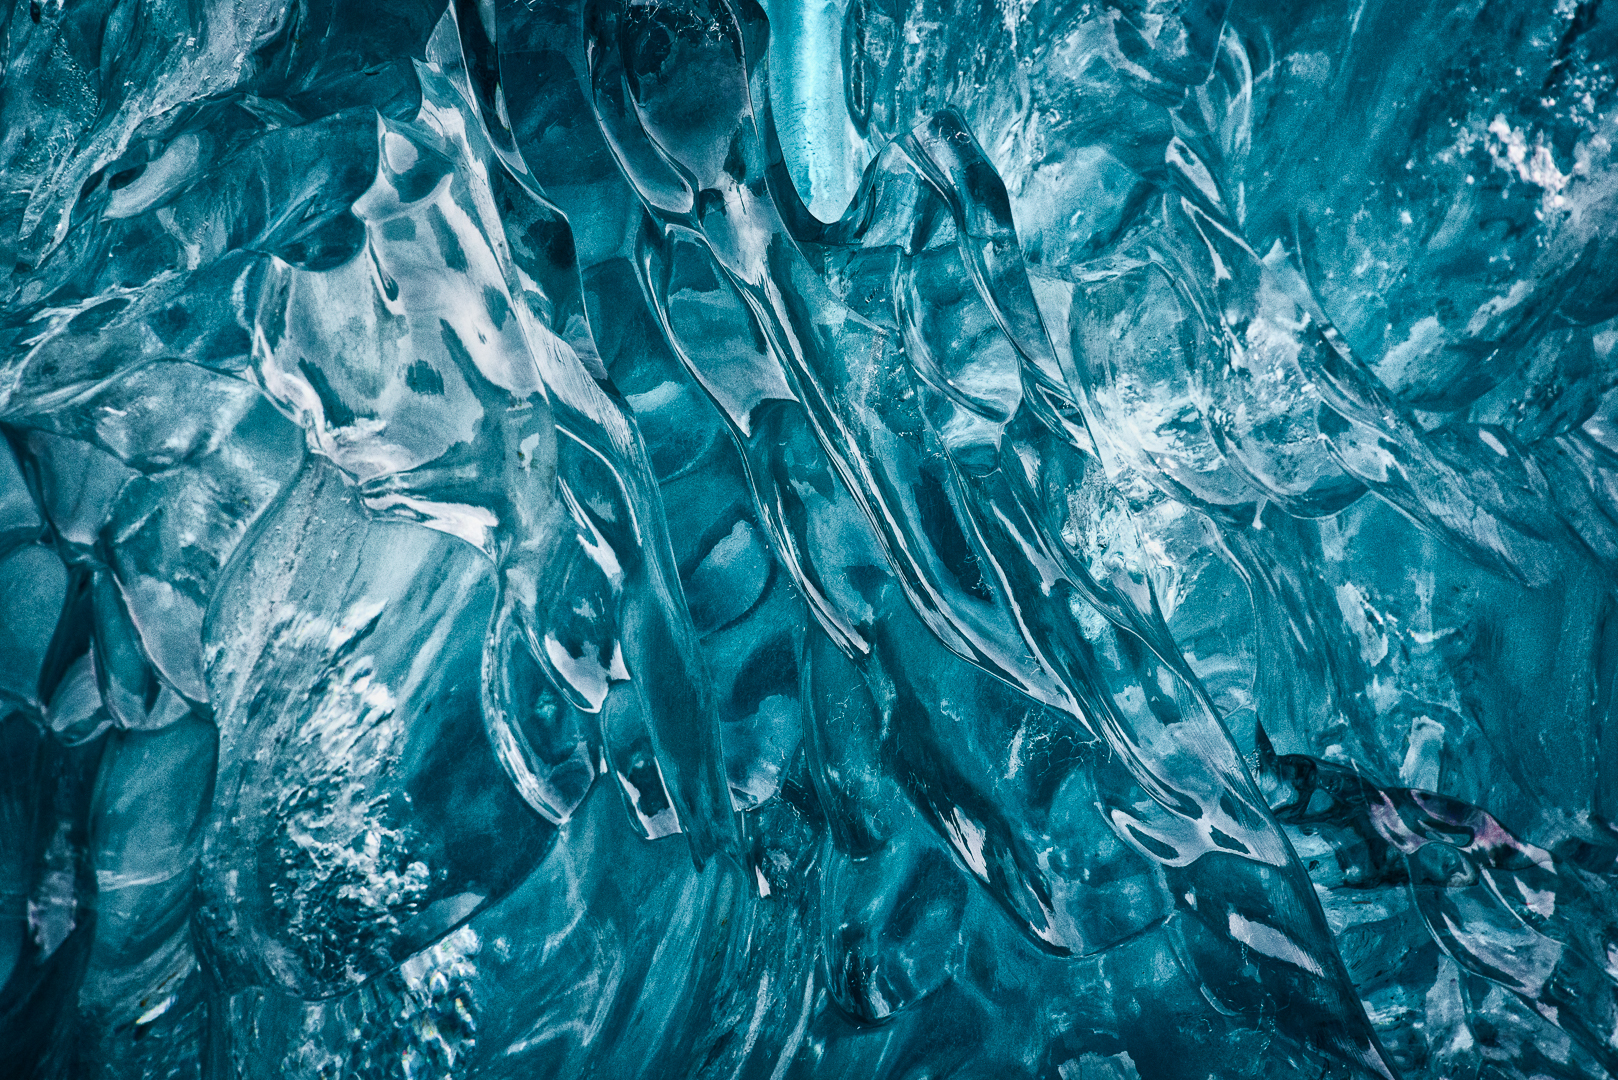 Ice Patterns, Greenland